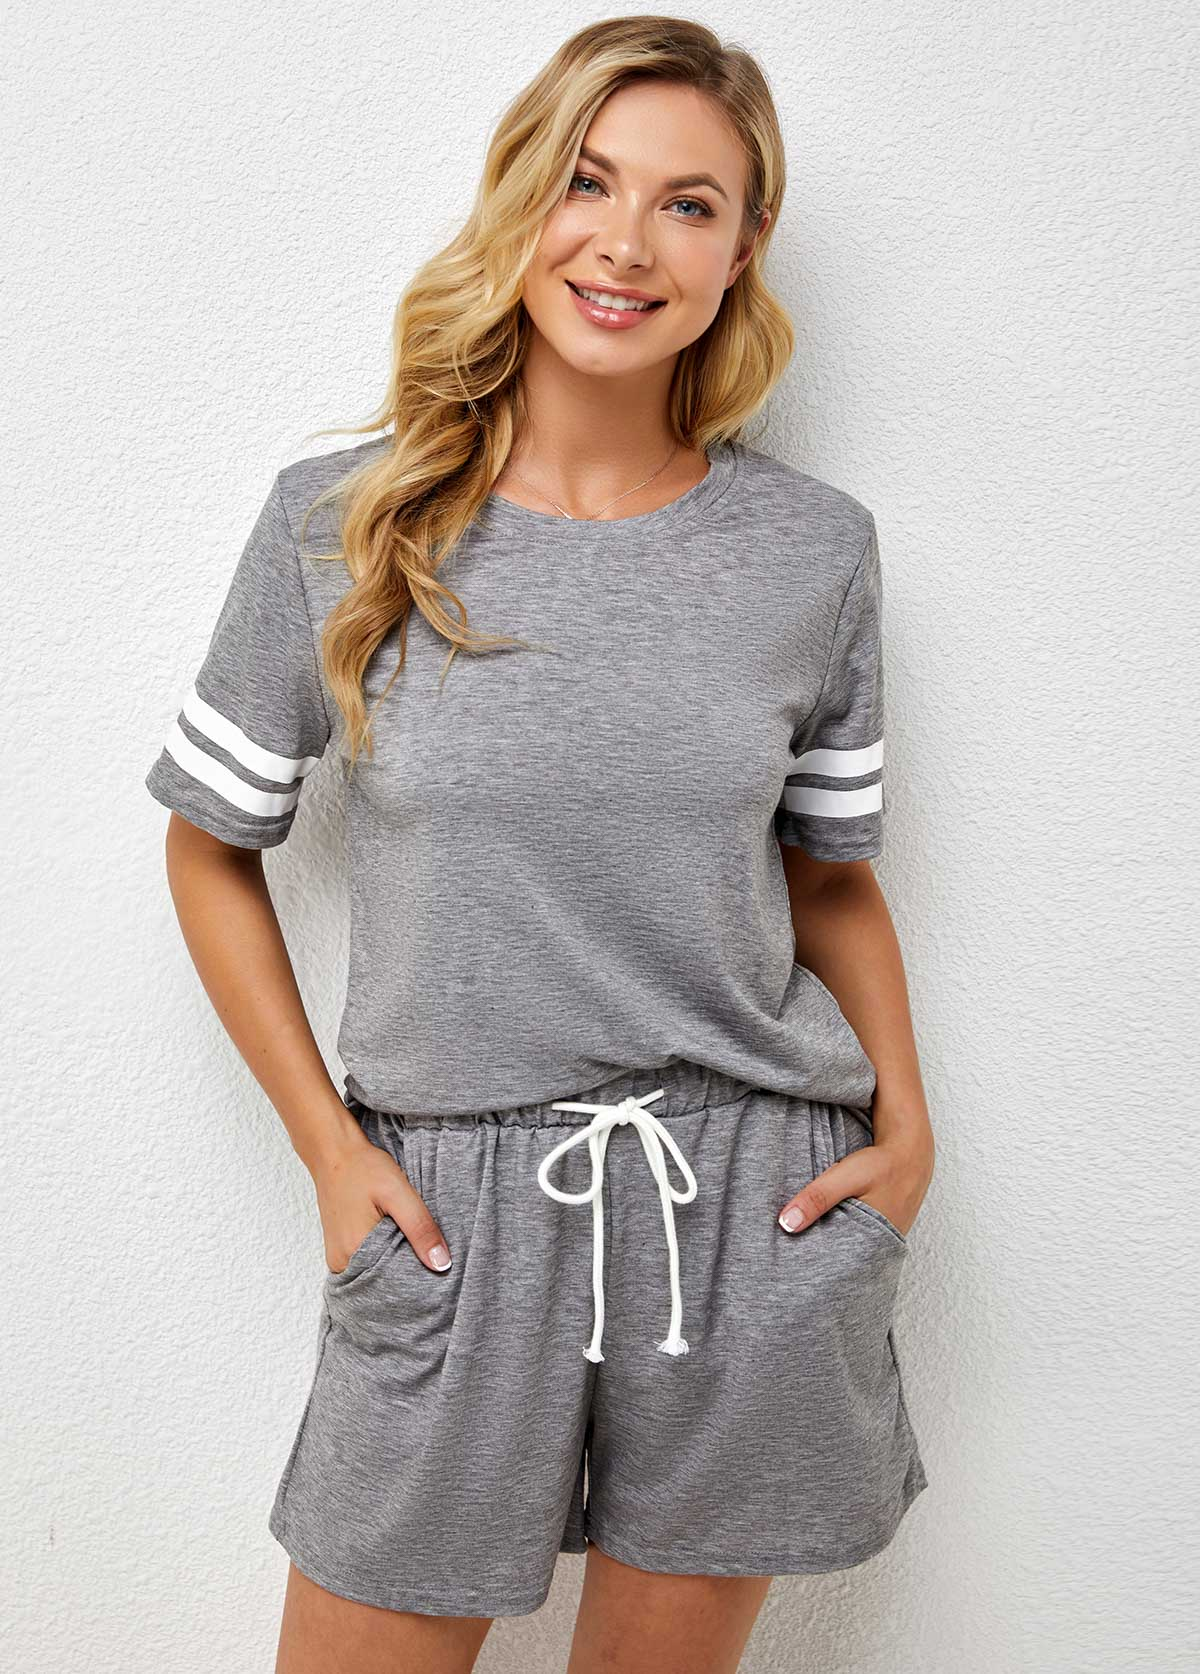 Drawstring Waist Pocket Striped Loungewear Set